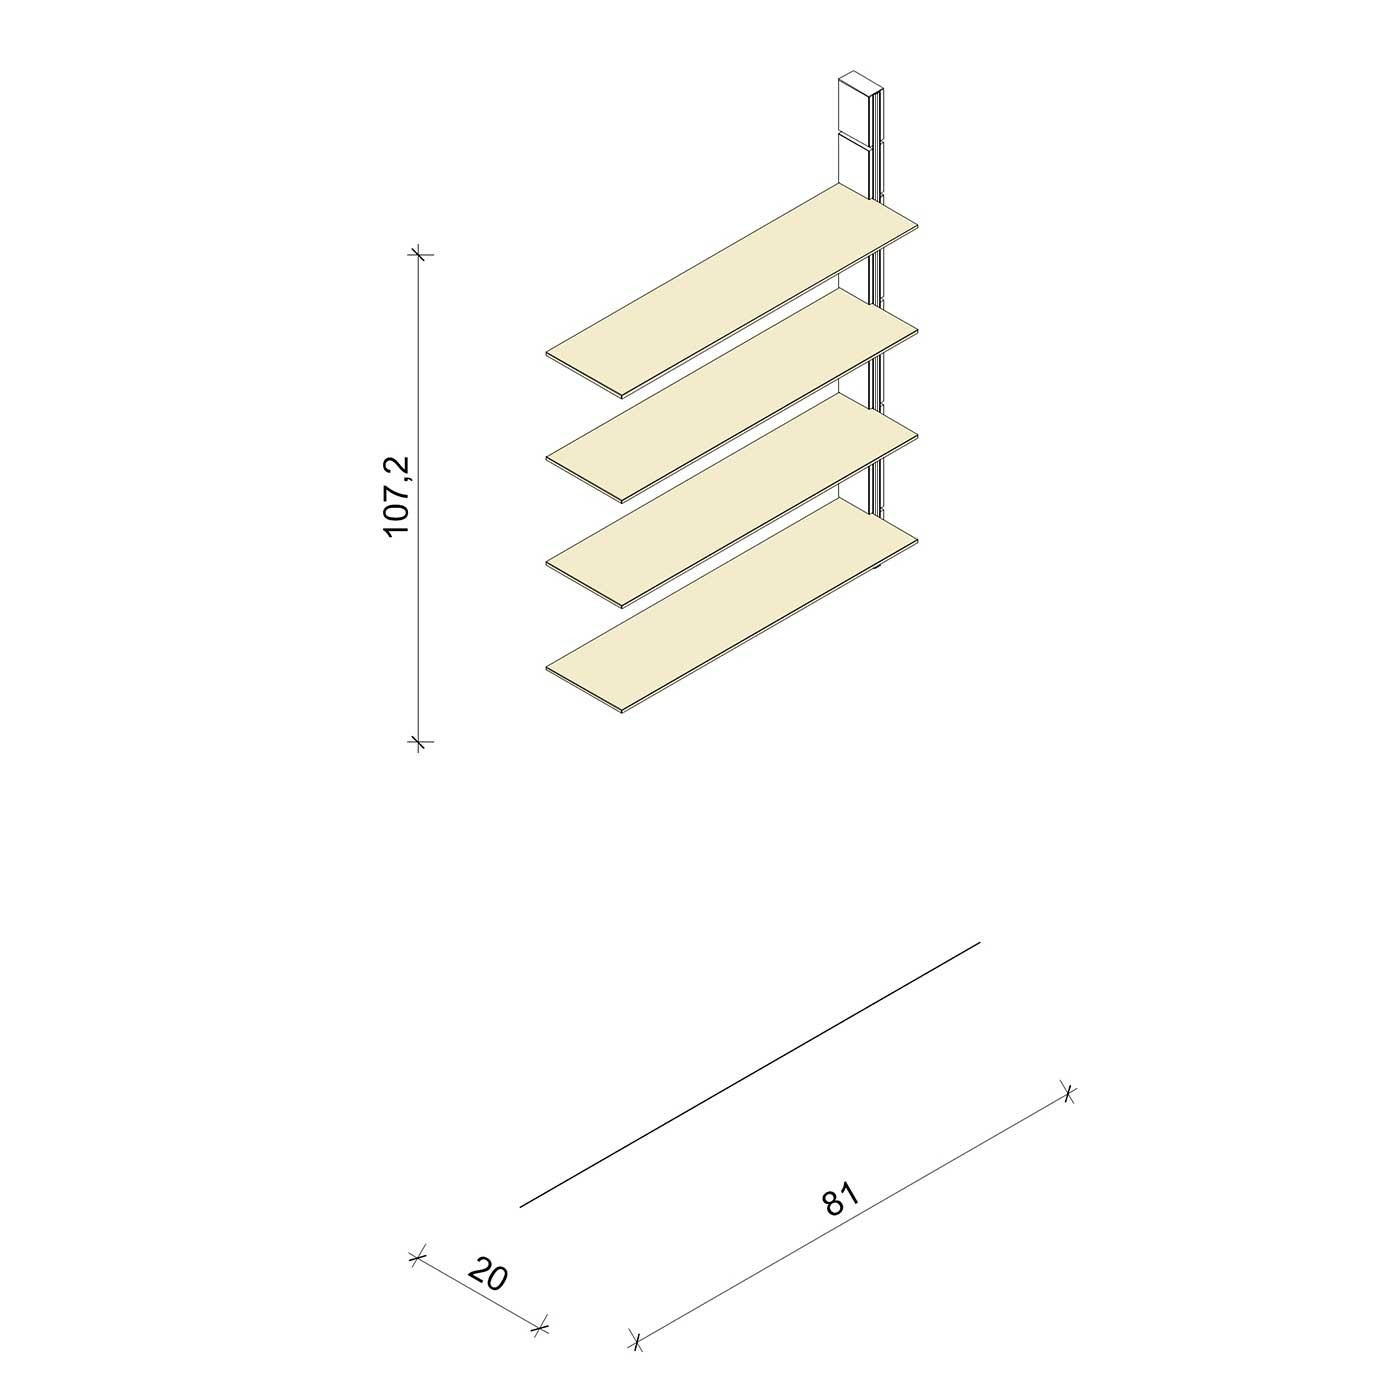 Bücherregal - Classic (M) 81 - Anbauelement - Maß: 81 x 107,2 x 20 cm (B x H x T)